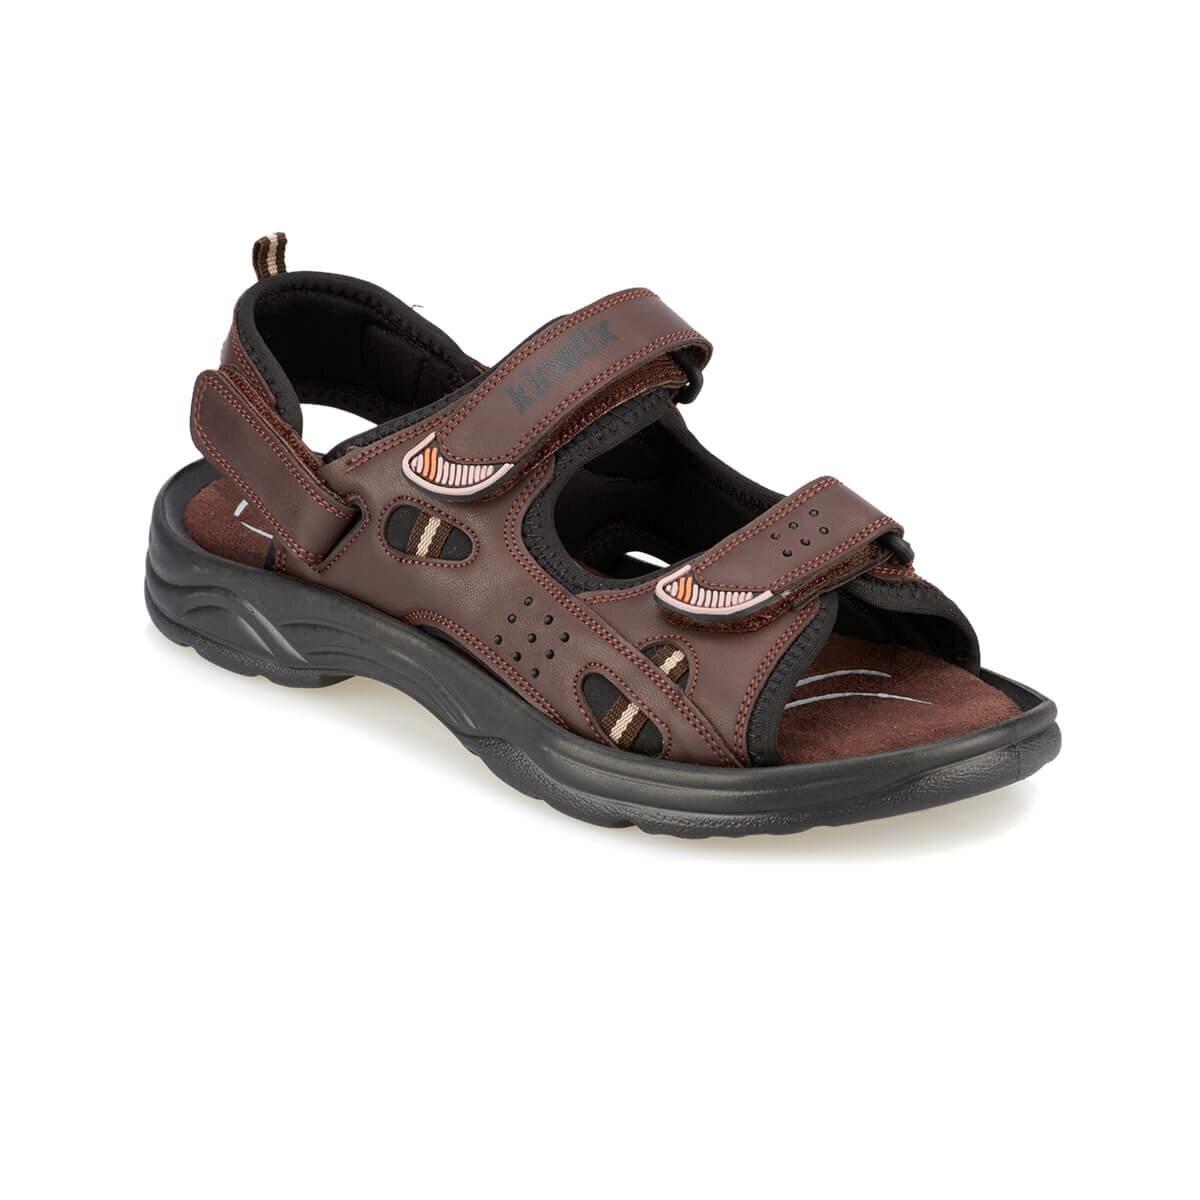 FLO BERTIE Brown Male Sandals KINETIX